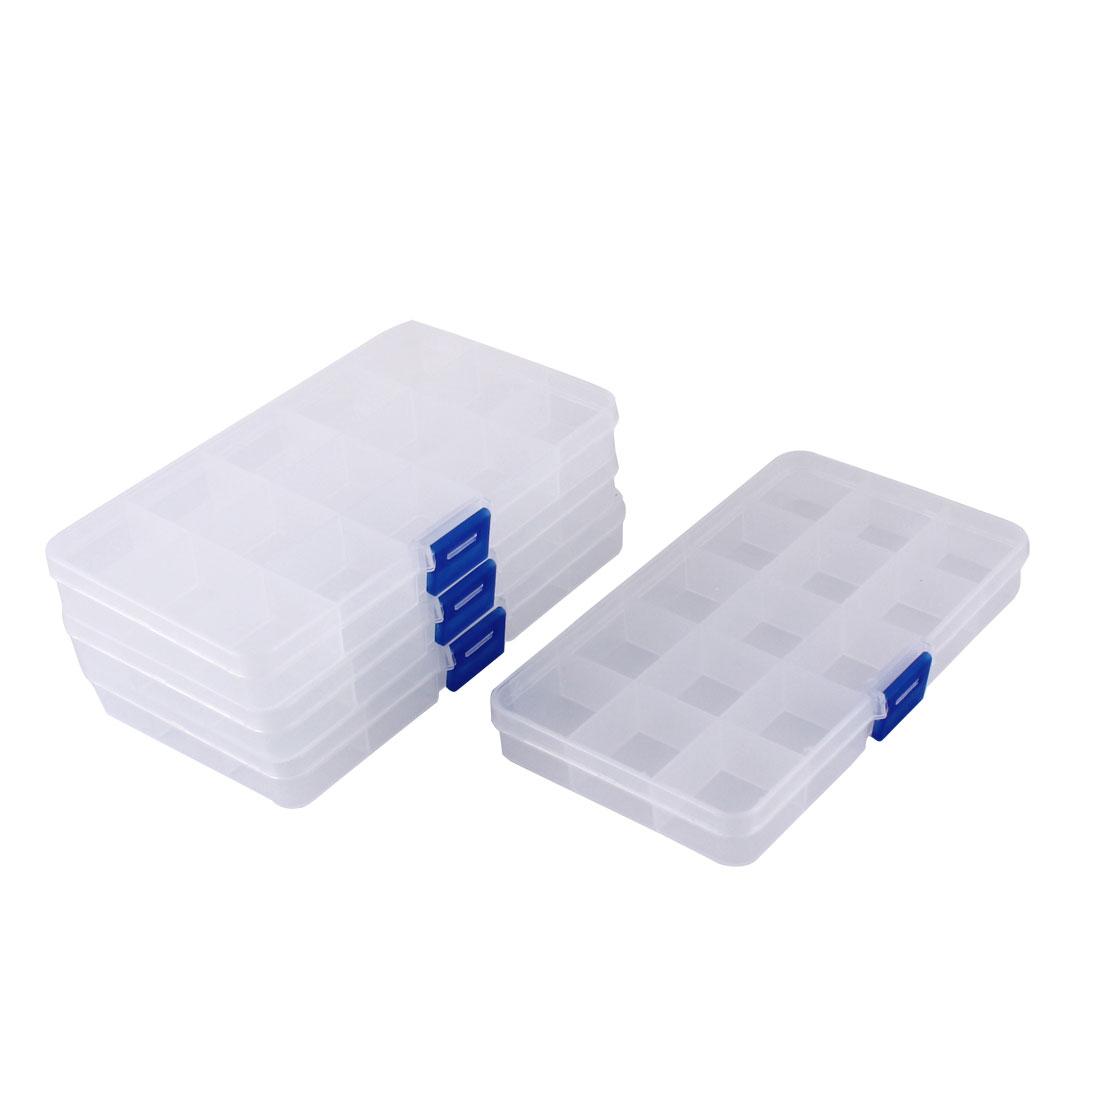 Plastic 15 Grid Electronic Components Storage Box DIY Case 4pcs